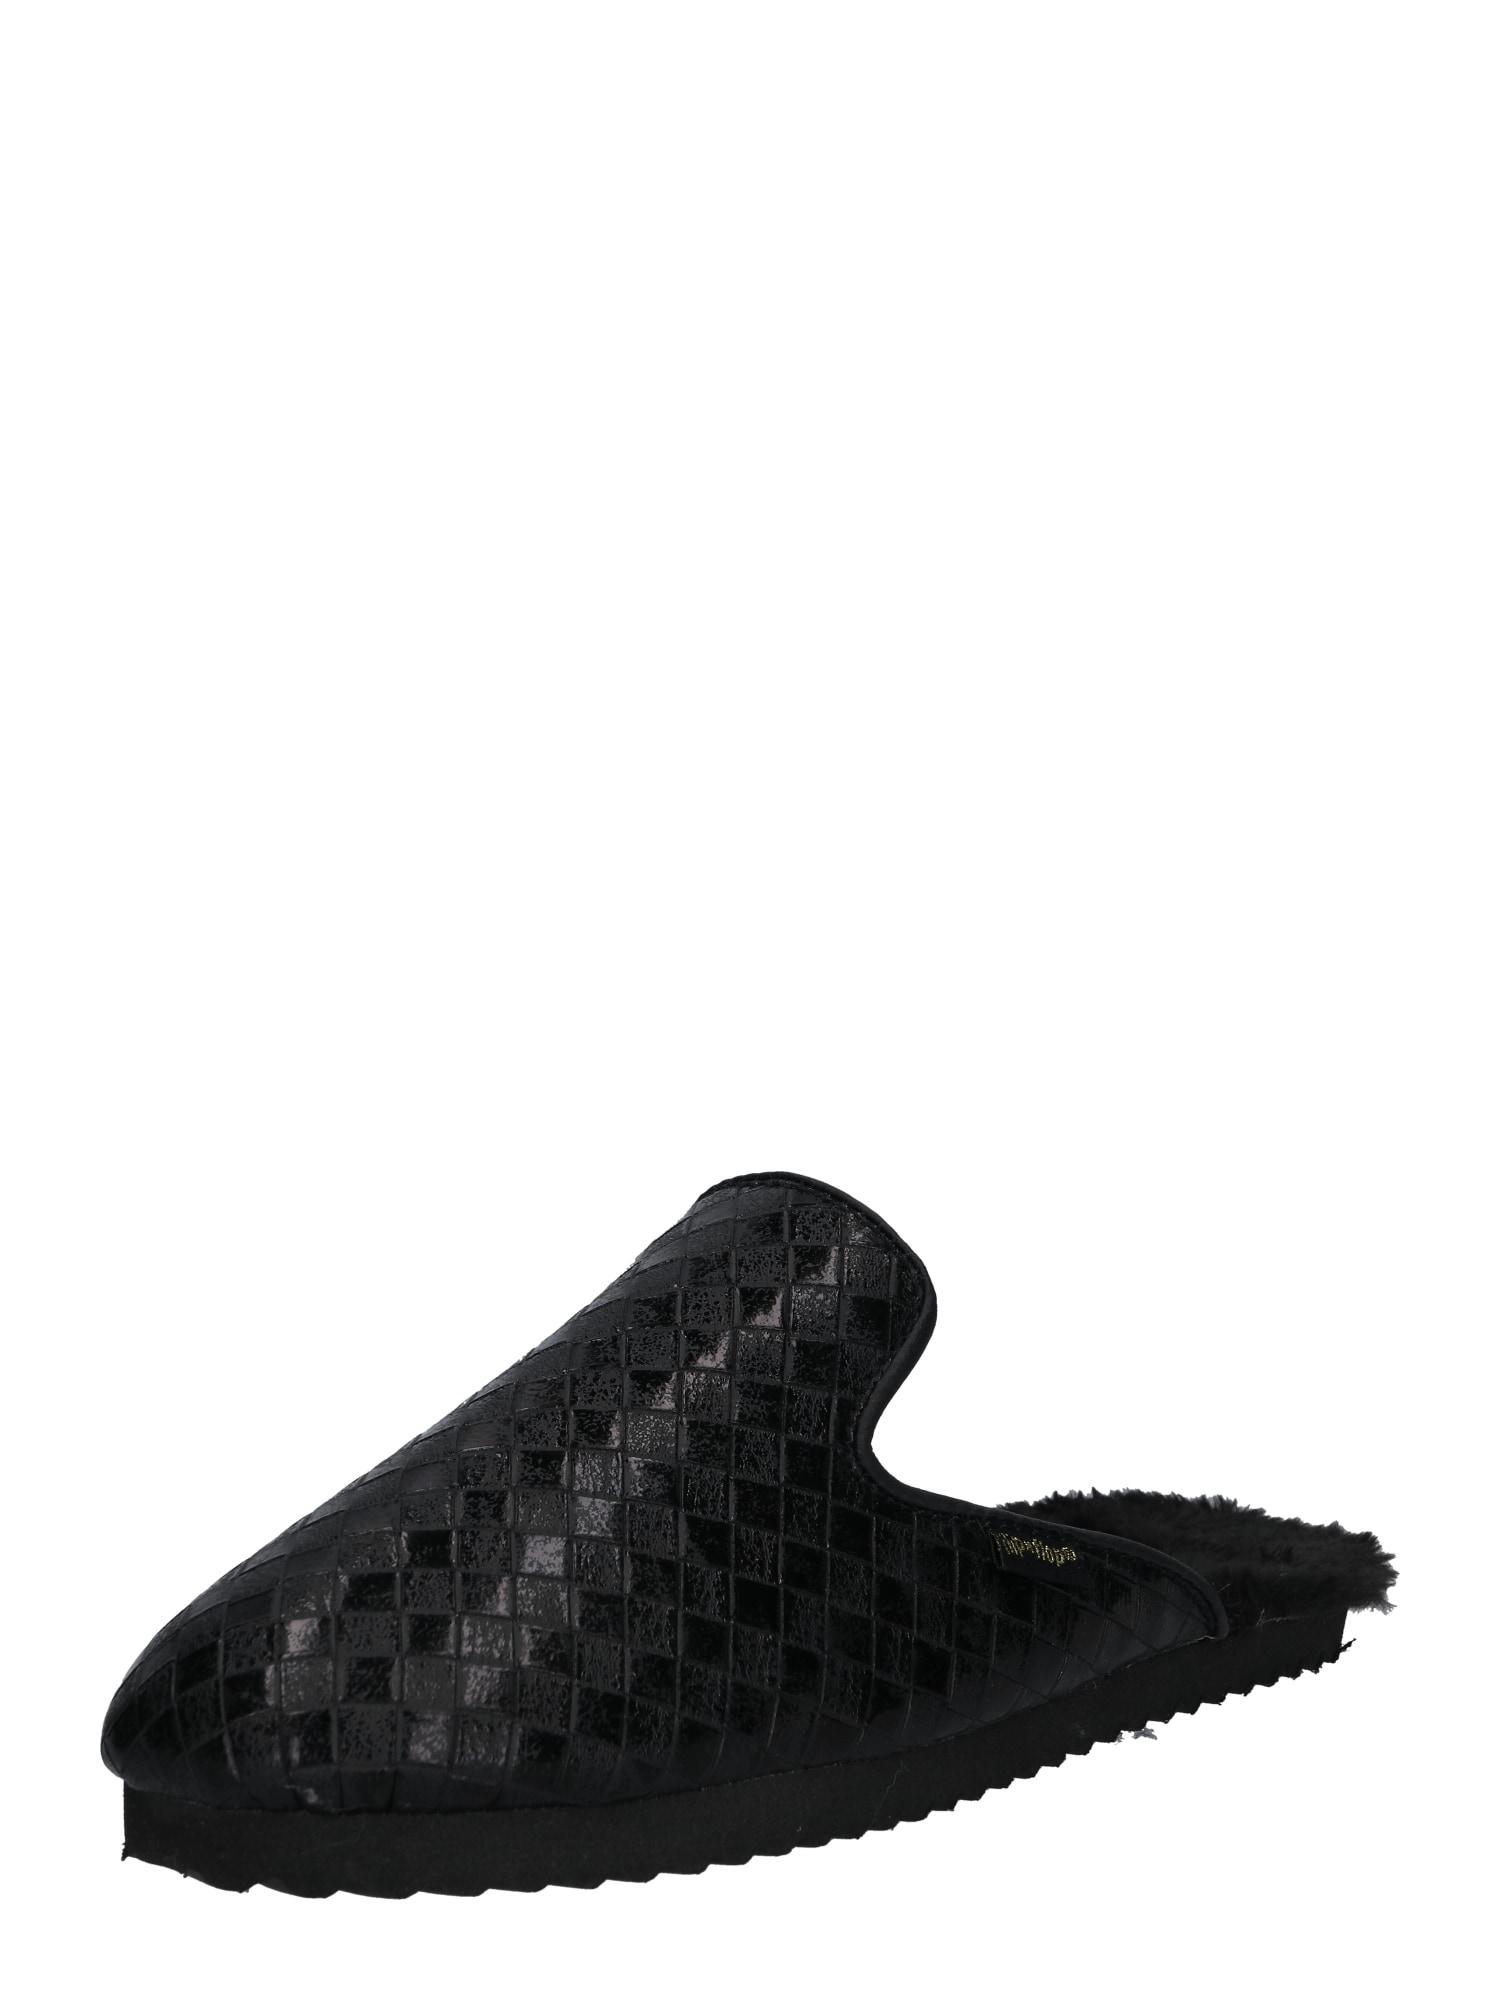 FLIPxFLOP Pantofle slipperxbraided černá FLIP*FLOP